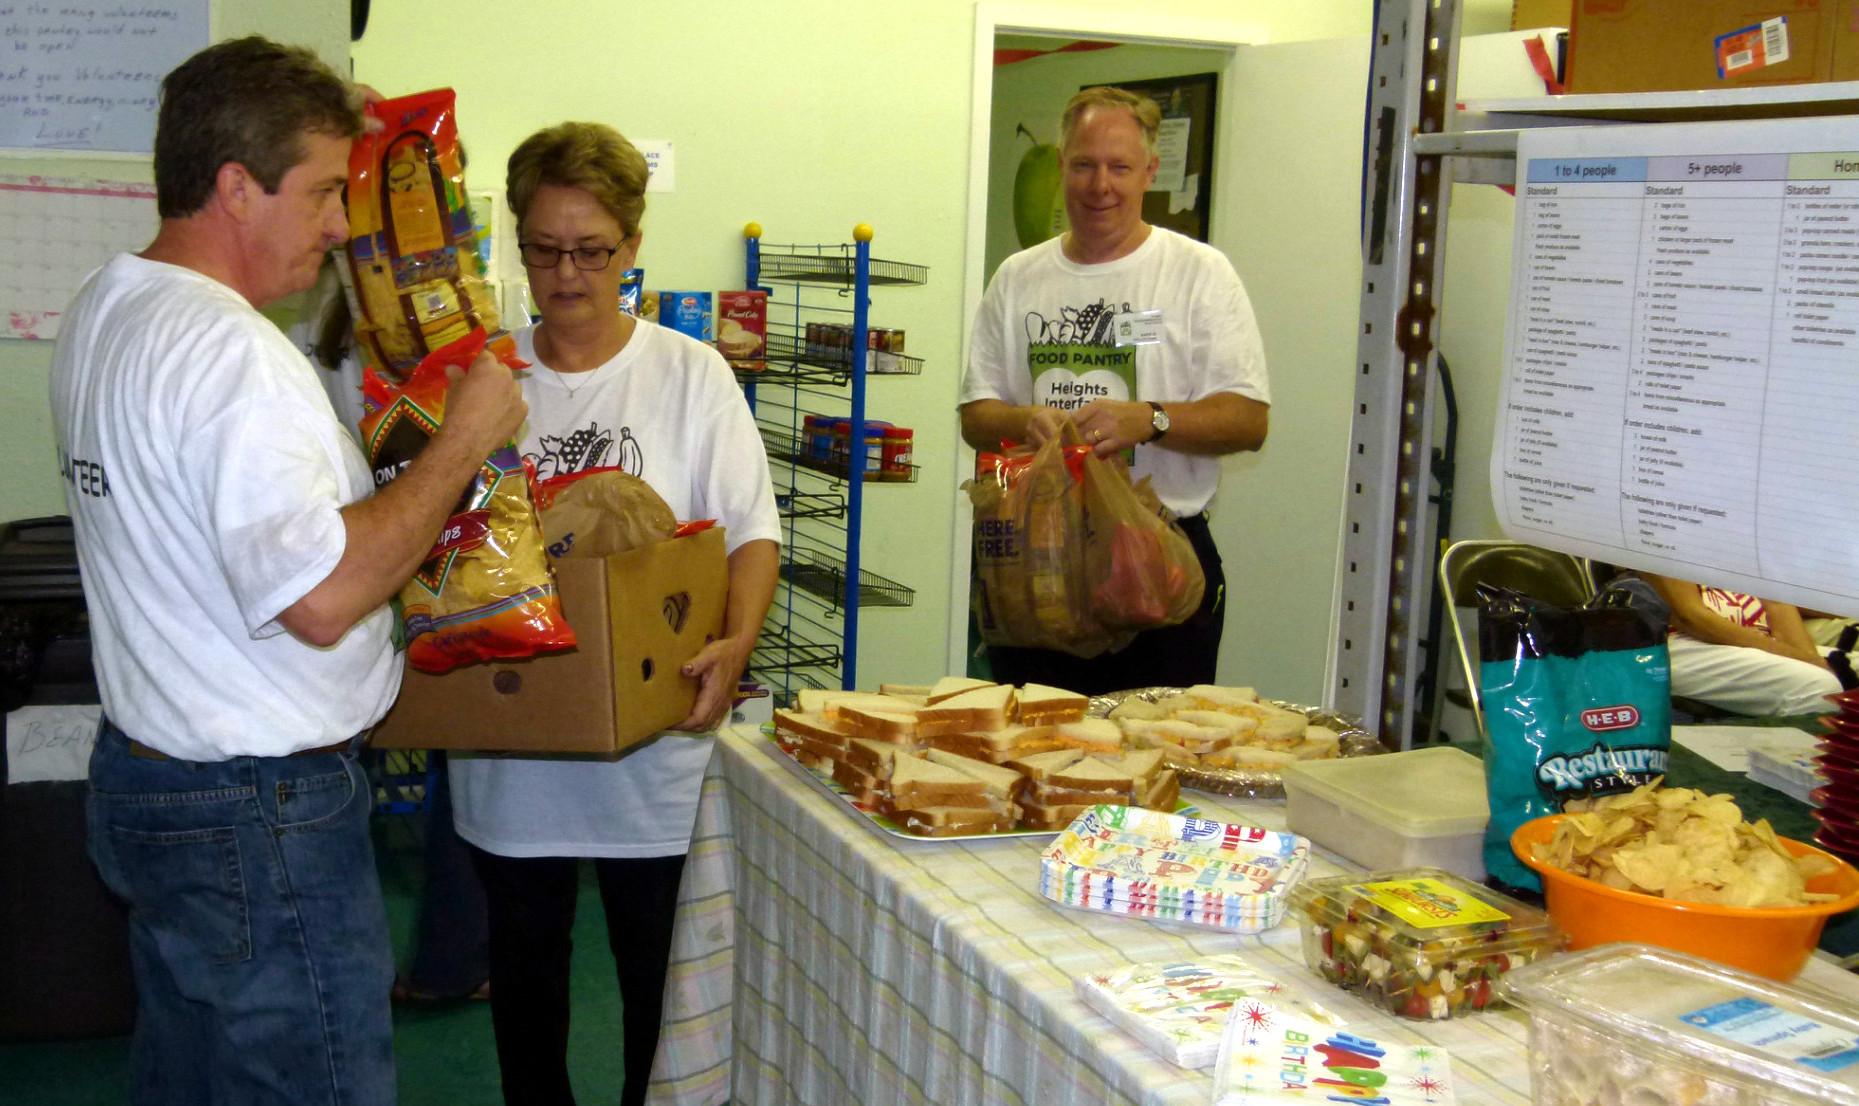 Helping Neighbors Food Pantry